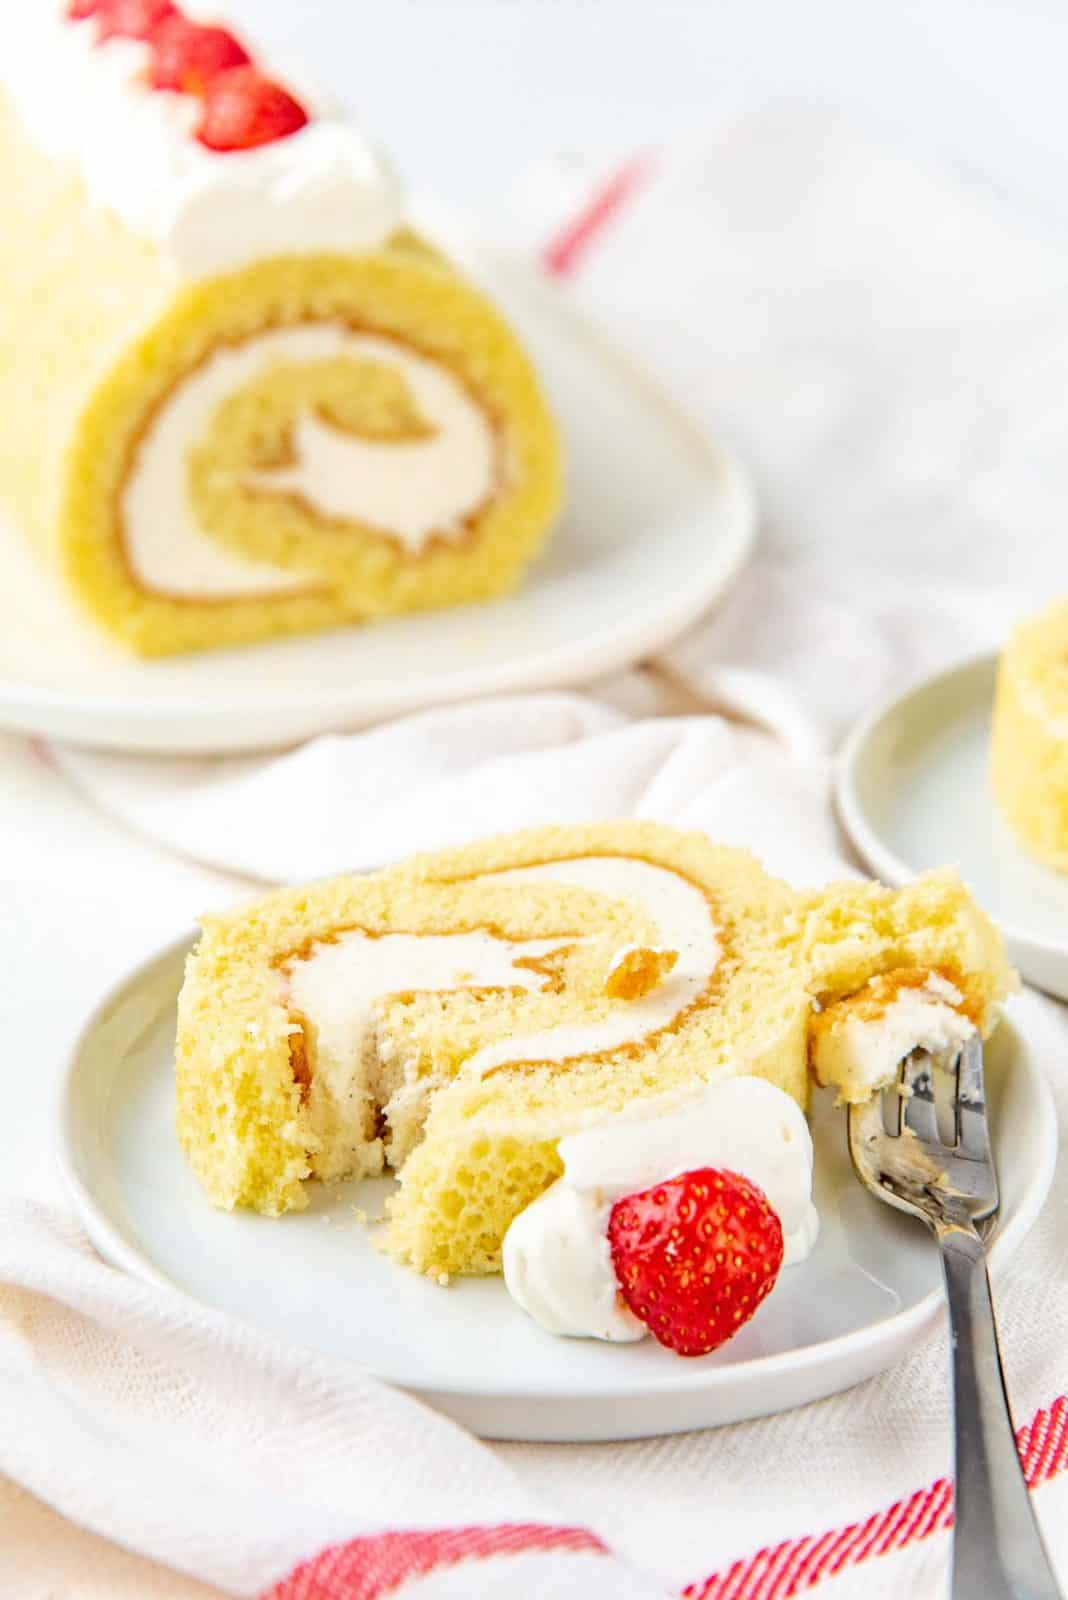 Perfect Vanilla Swiss Roll Recipe - The Flavor Bender